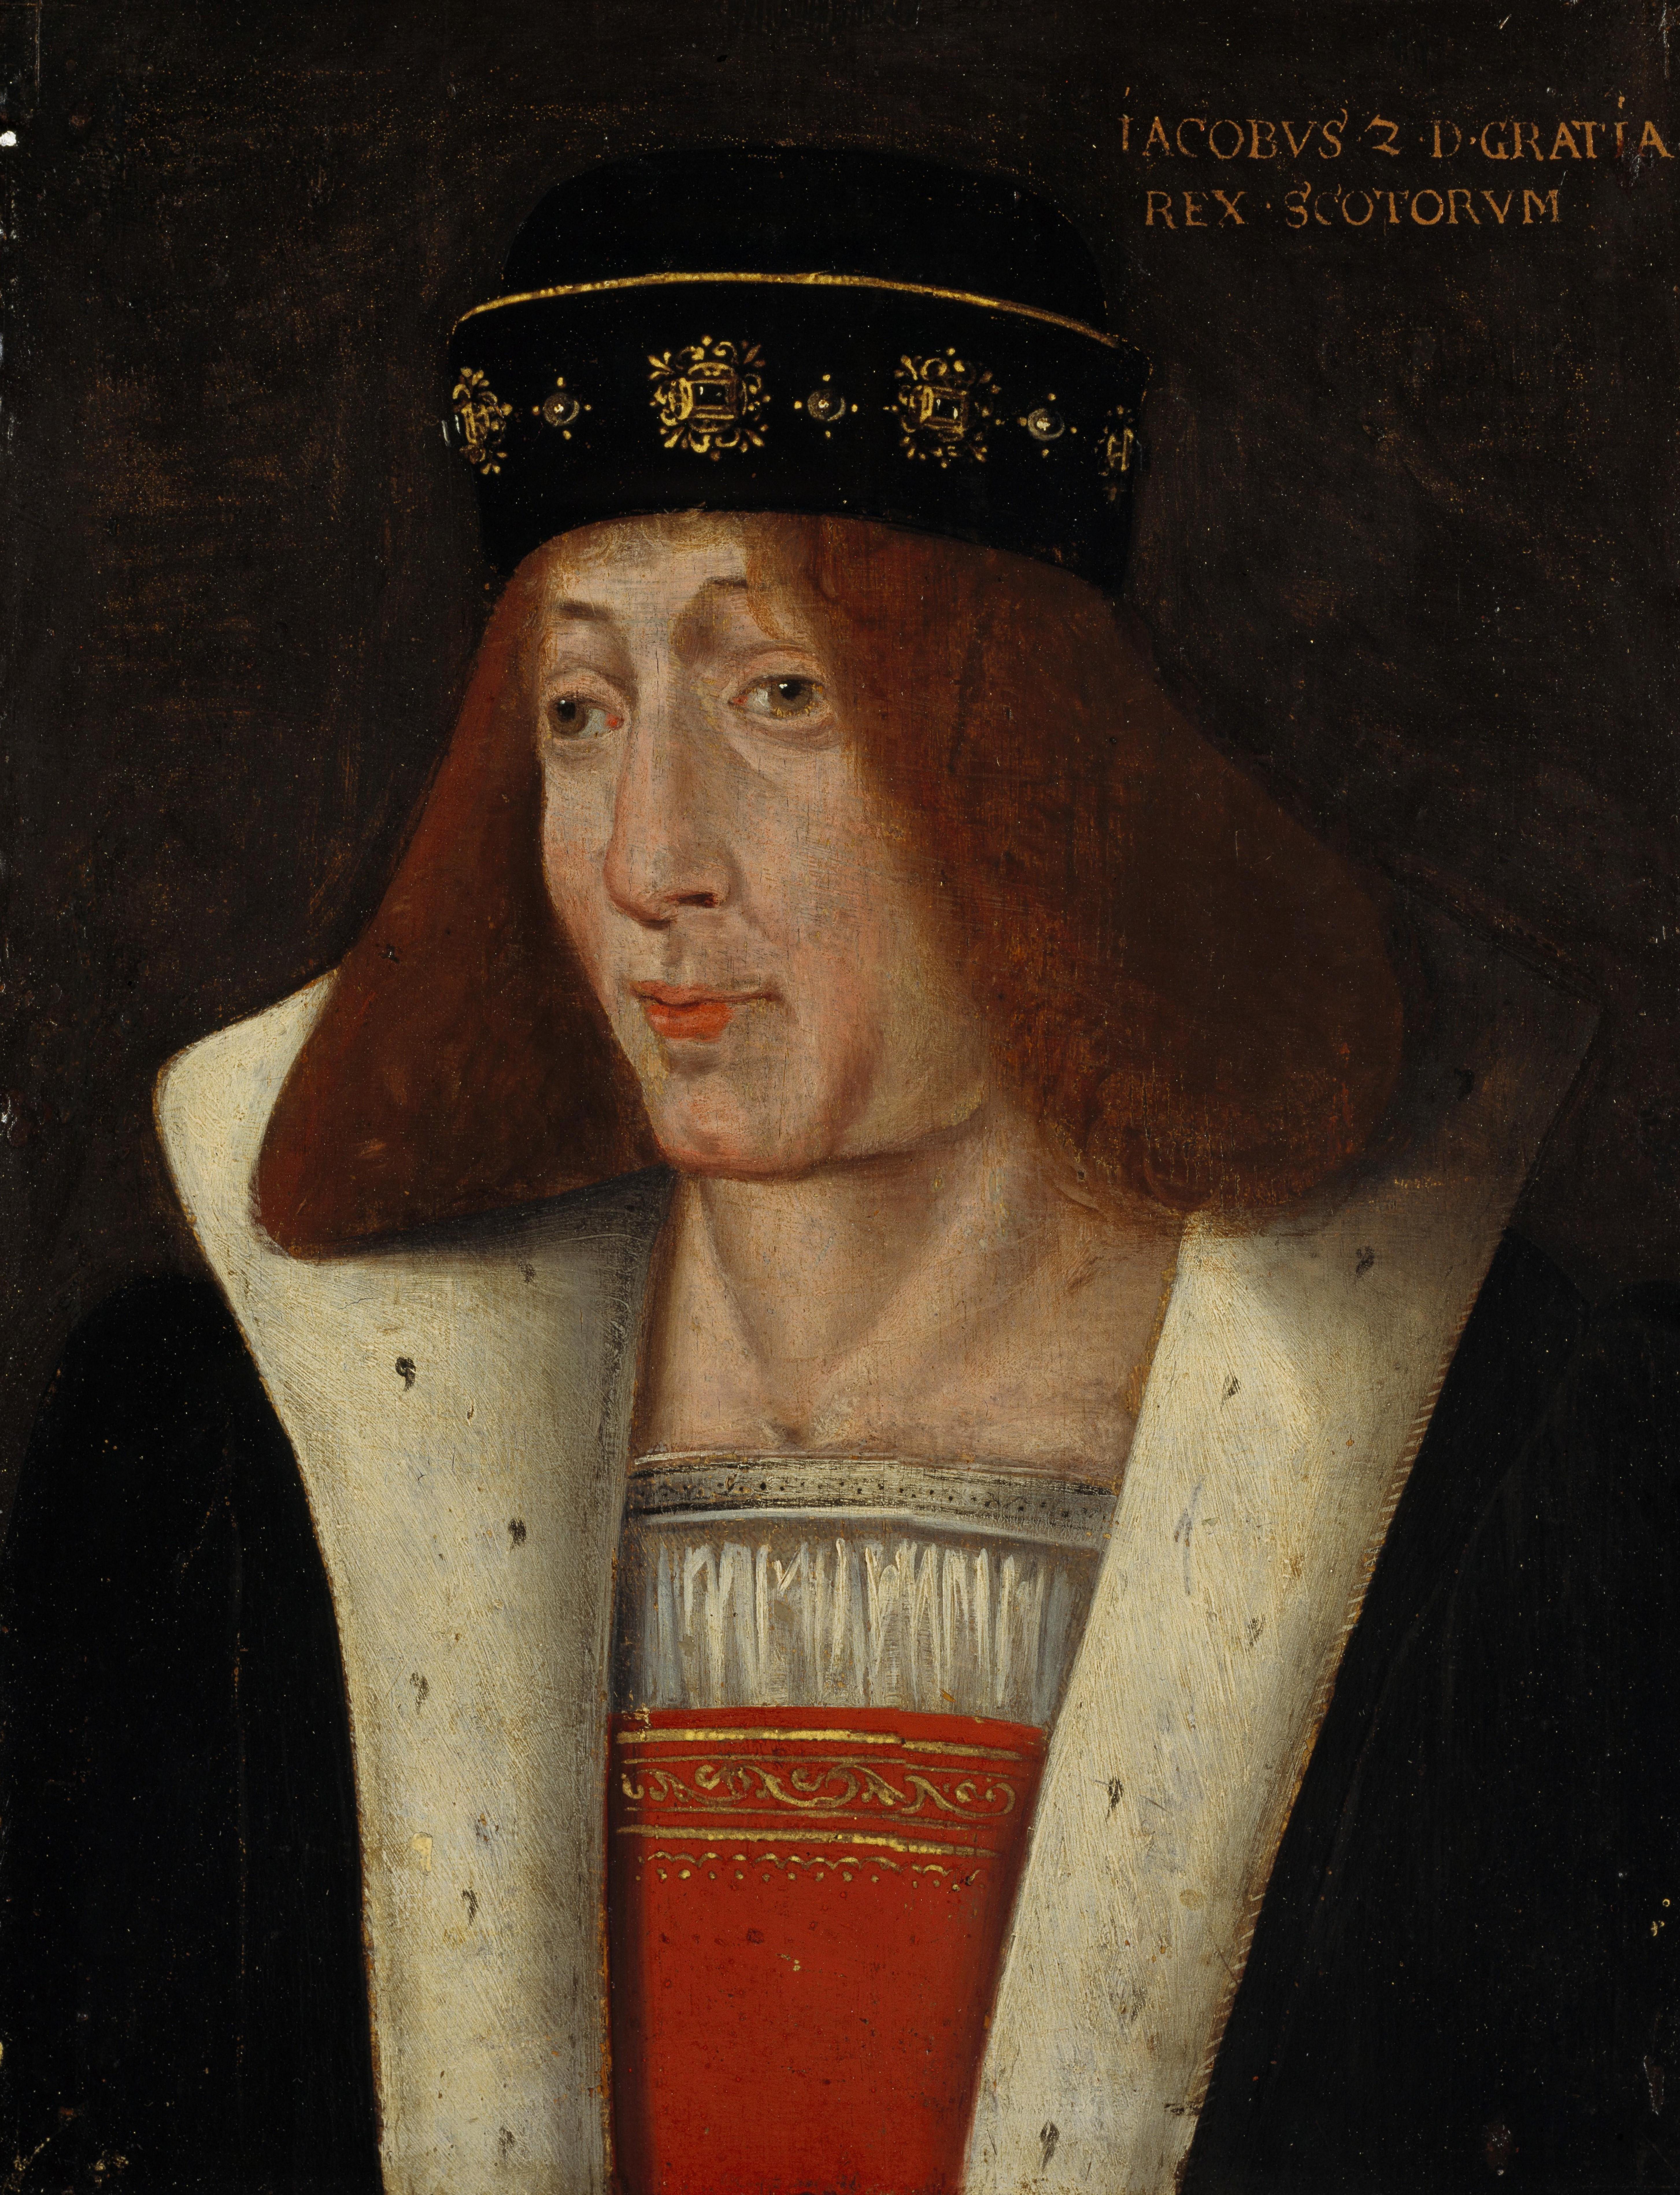 A oil portrait of King James II of Scotland